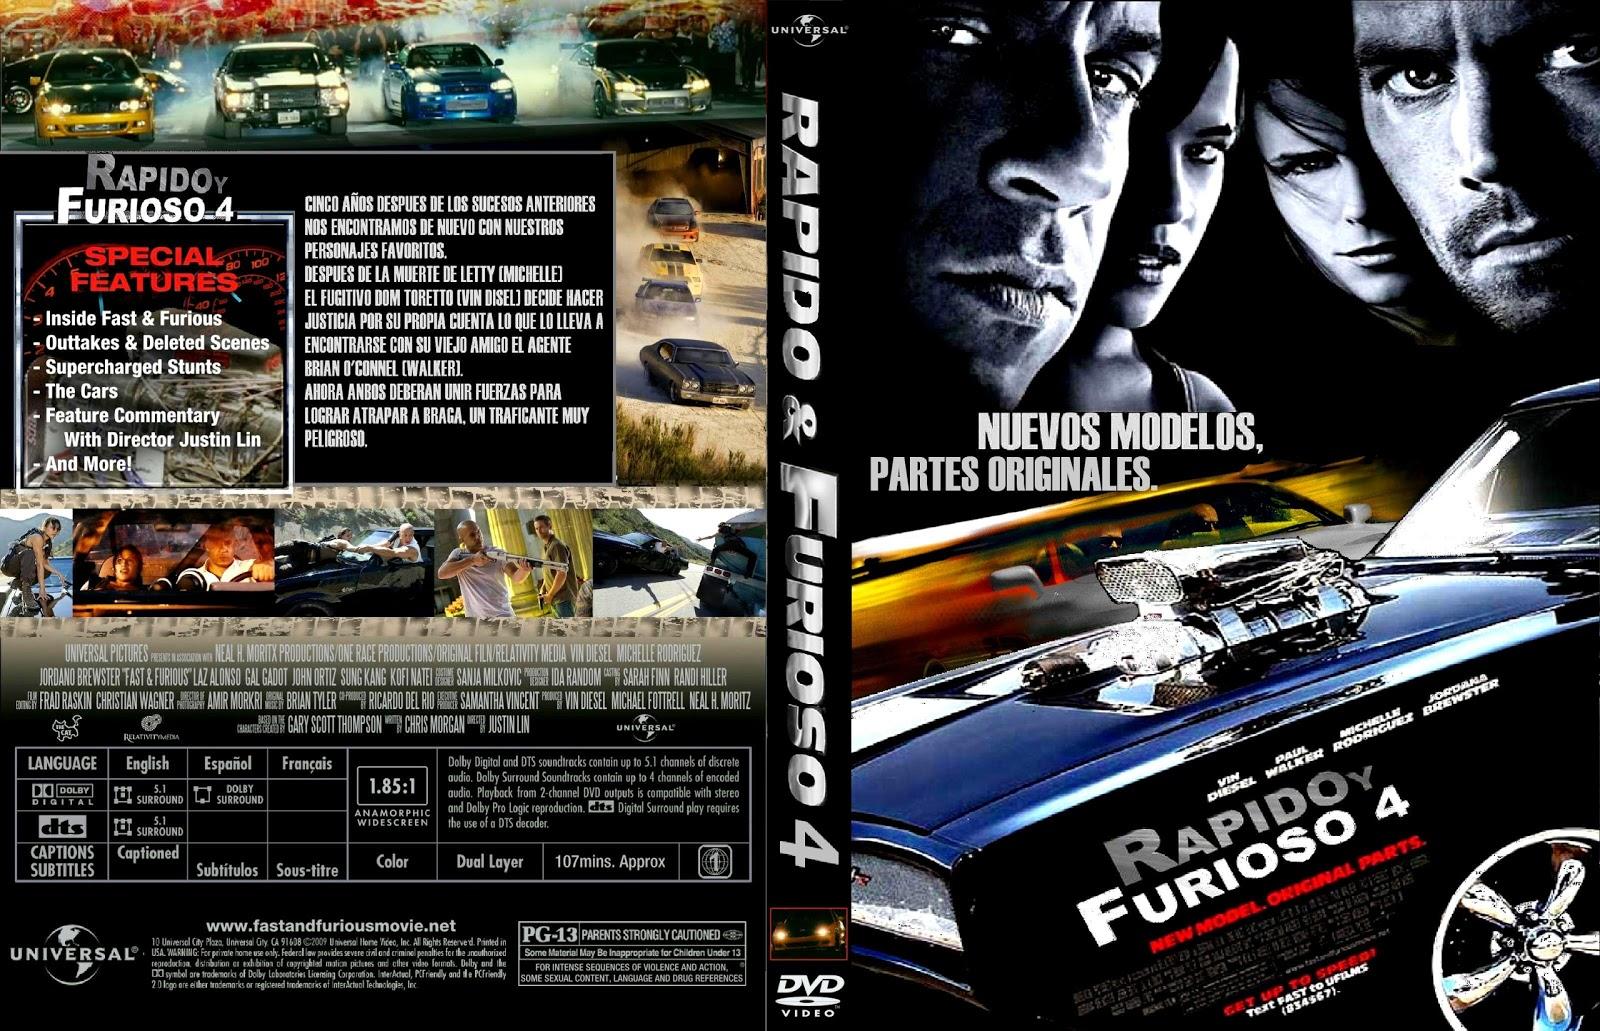 http://1.bp.blogspot.com/_6eUvg3AM_CQ/TNR1mB29EOI/AAAAAAAAAL4/HrNQxzldDdg/s1600/Rapido_Y_Furioso_4_-_Custom_-_V2_por_jonatan_casas.jpg